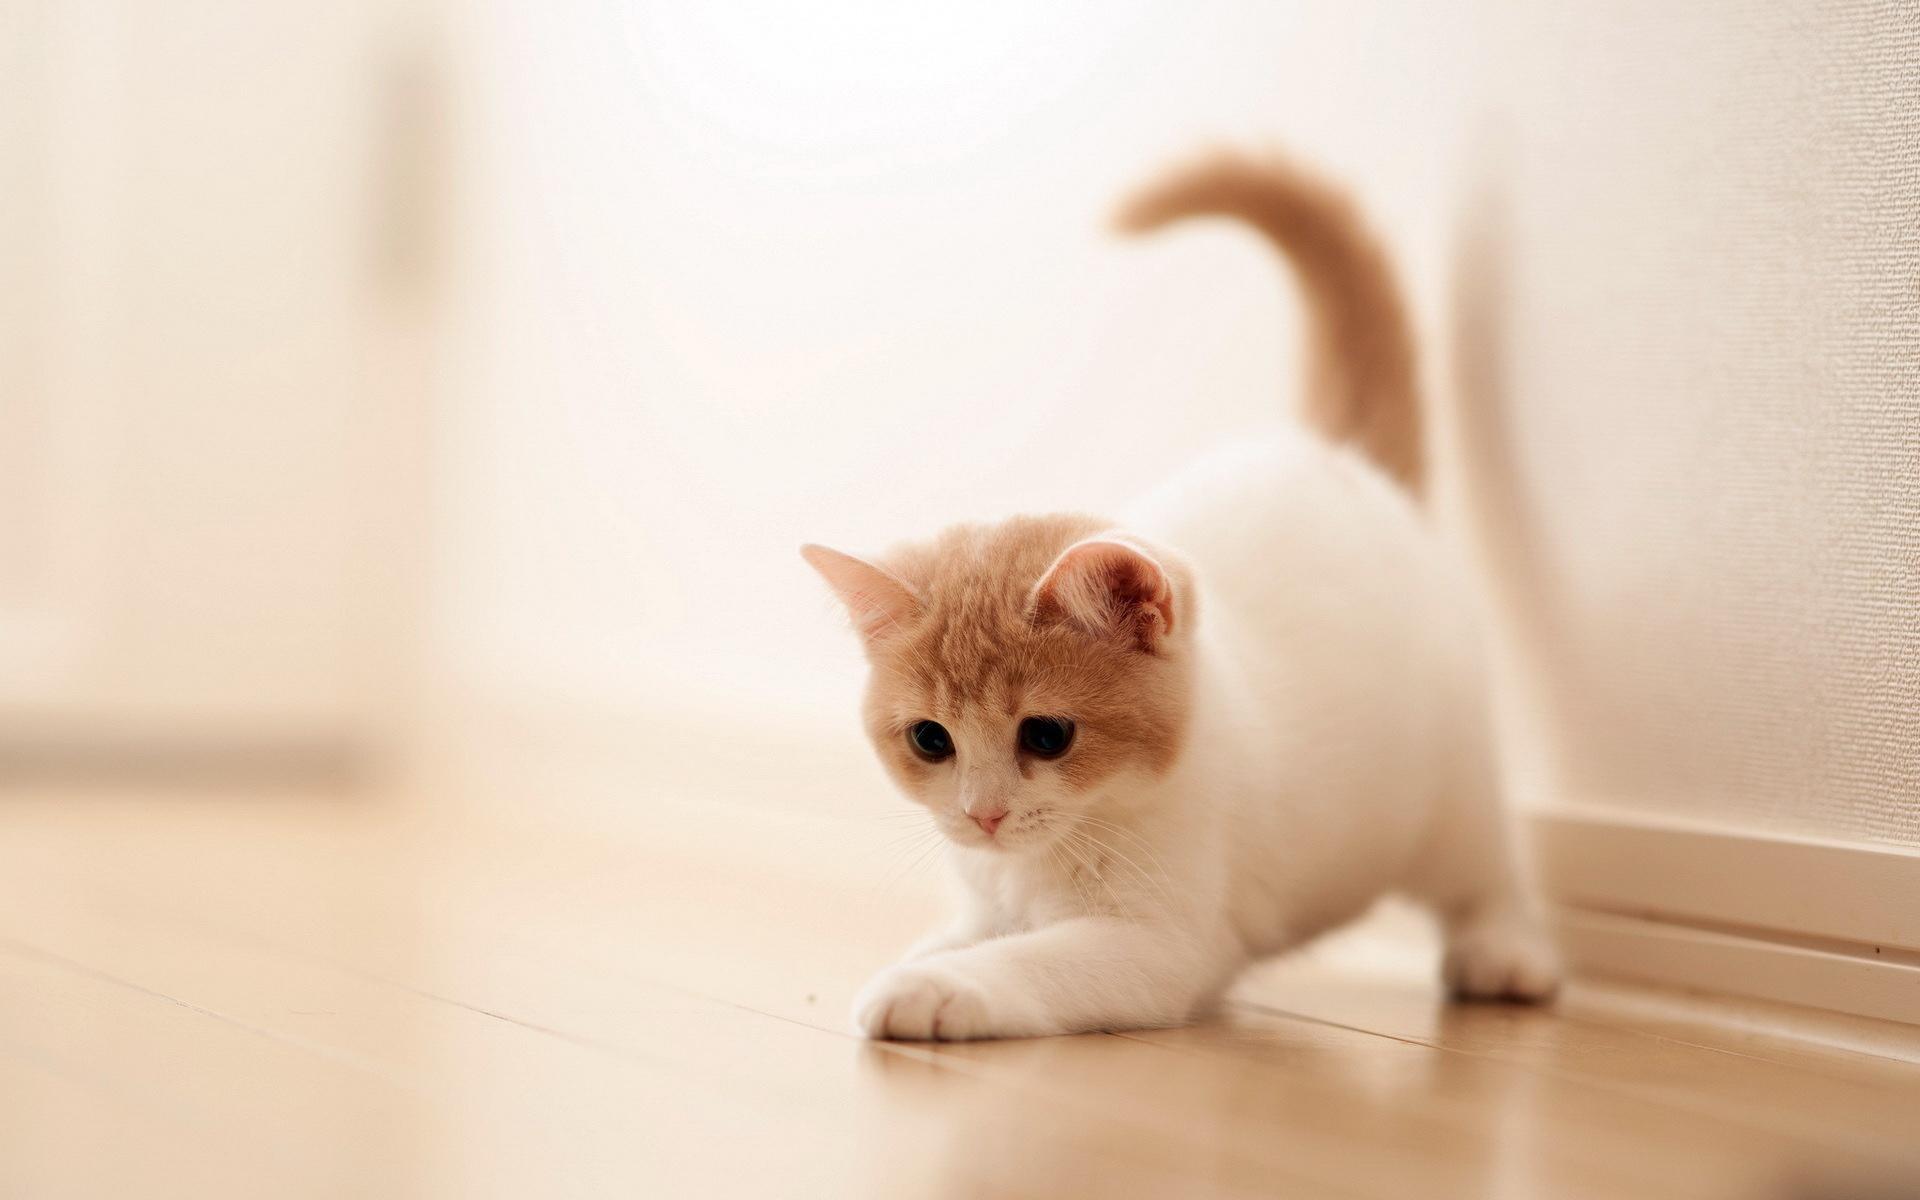 Cute Cat Wallpapers for Desktop (66+ images)